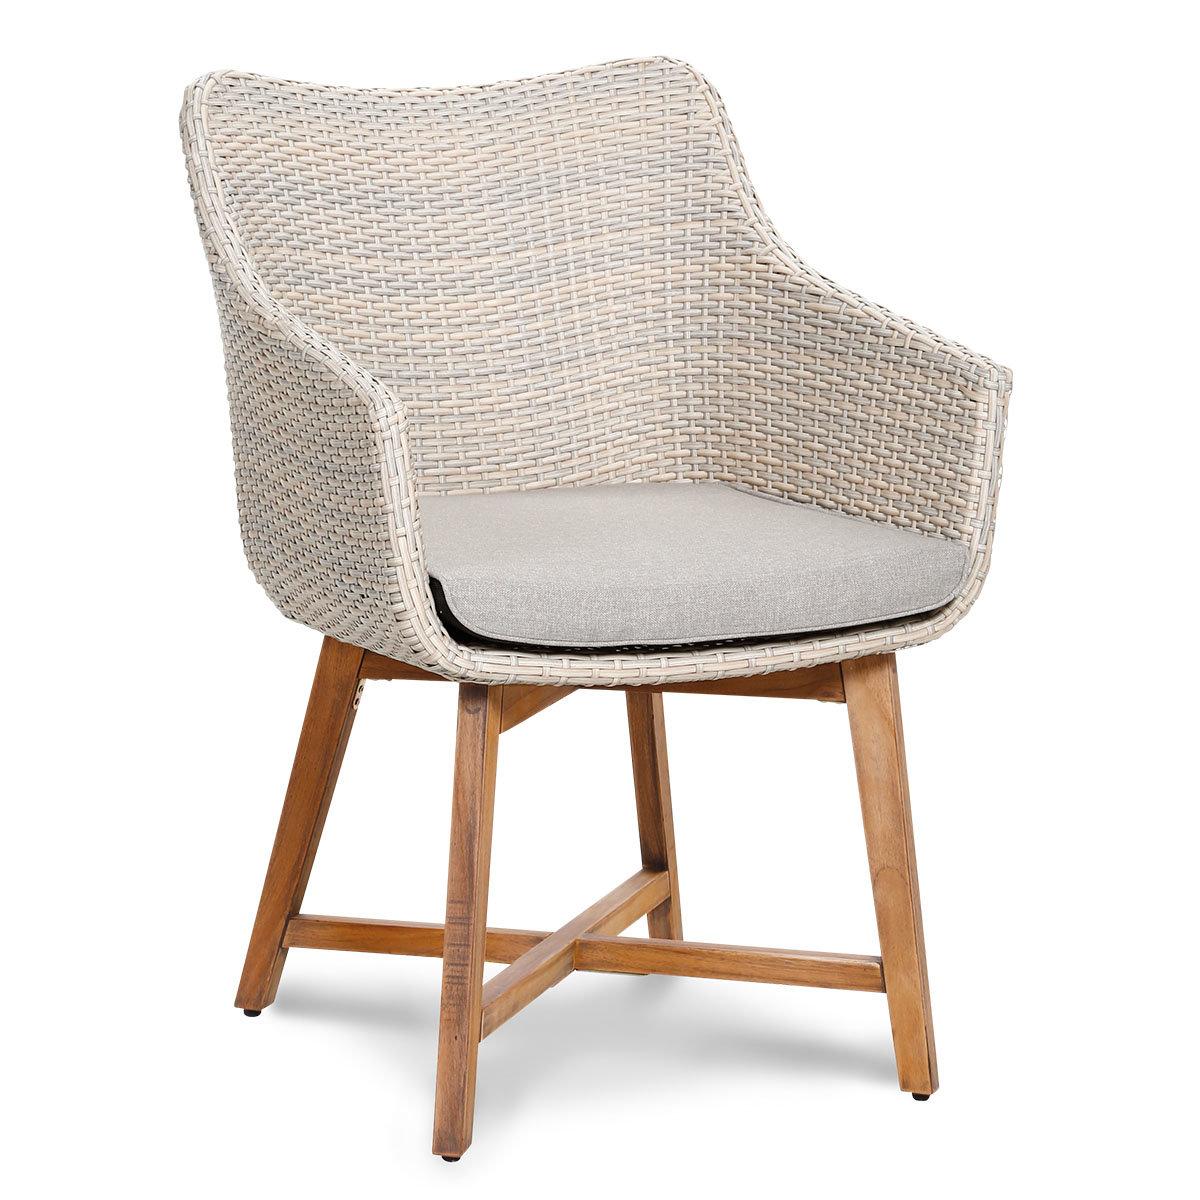 dining set paterna 6 personen online kaufen bei g rtner p tschke. Black Bedroom Furniture Sets. Home Design Ideas